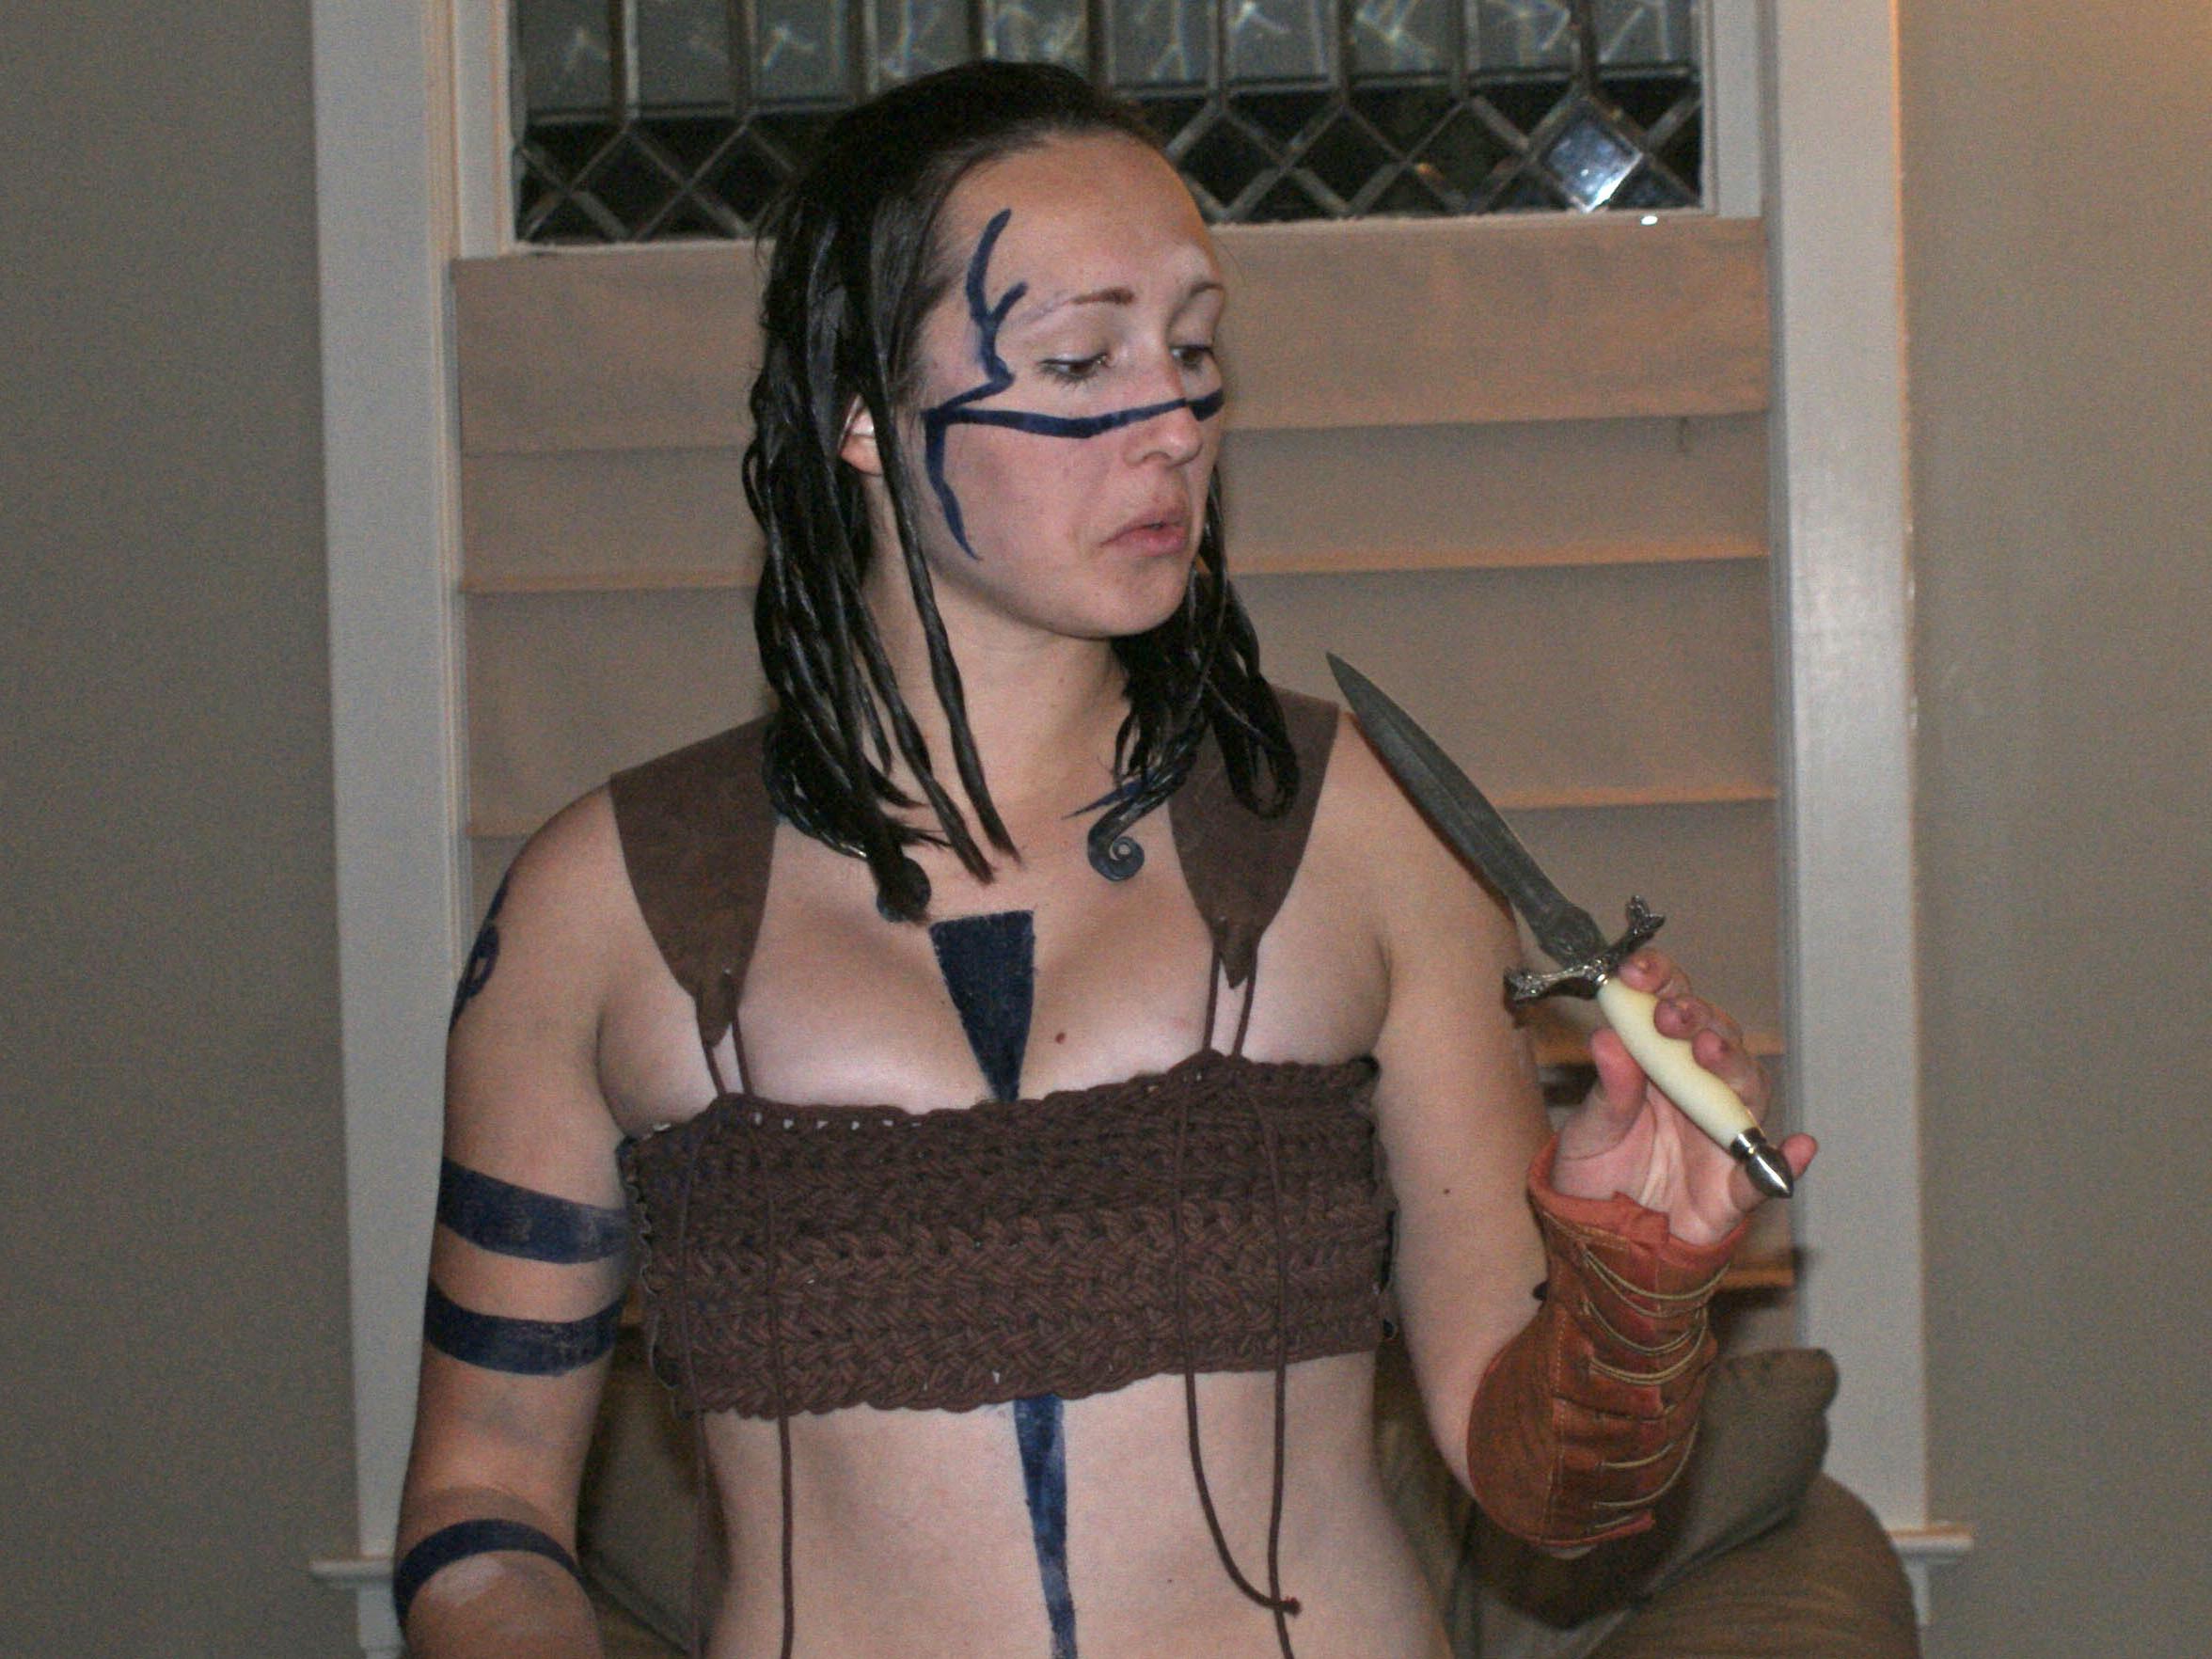 Celtic Warrior Costume (entirelyhandmade)